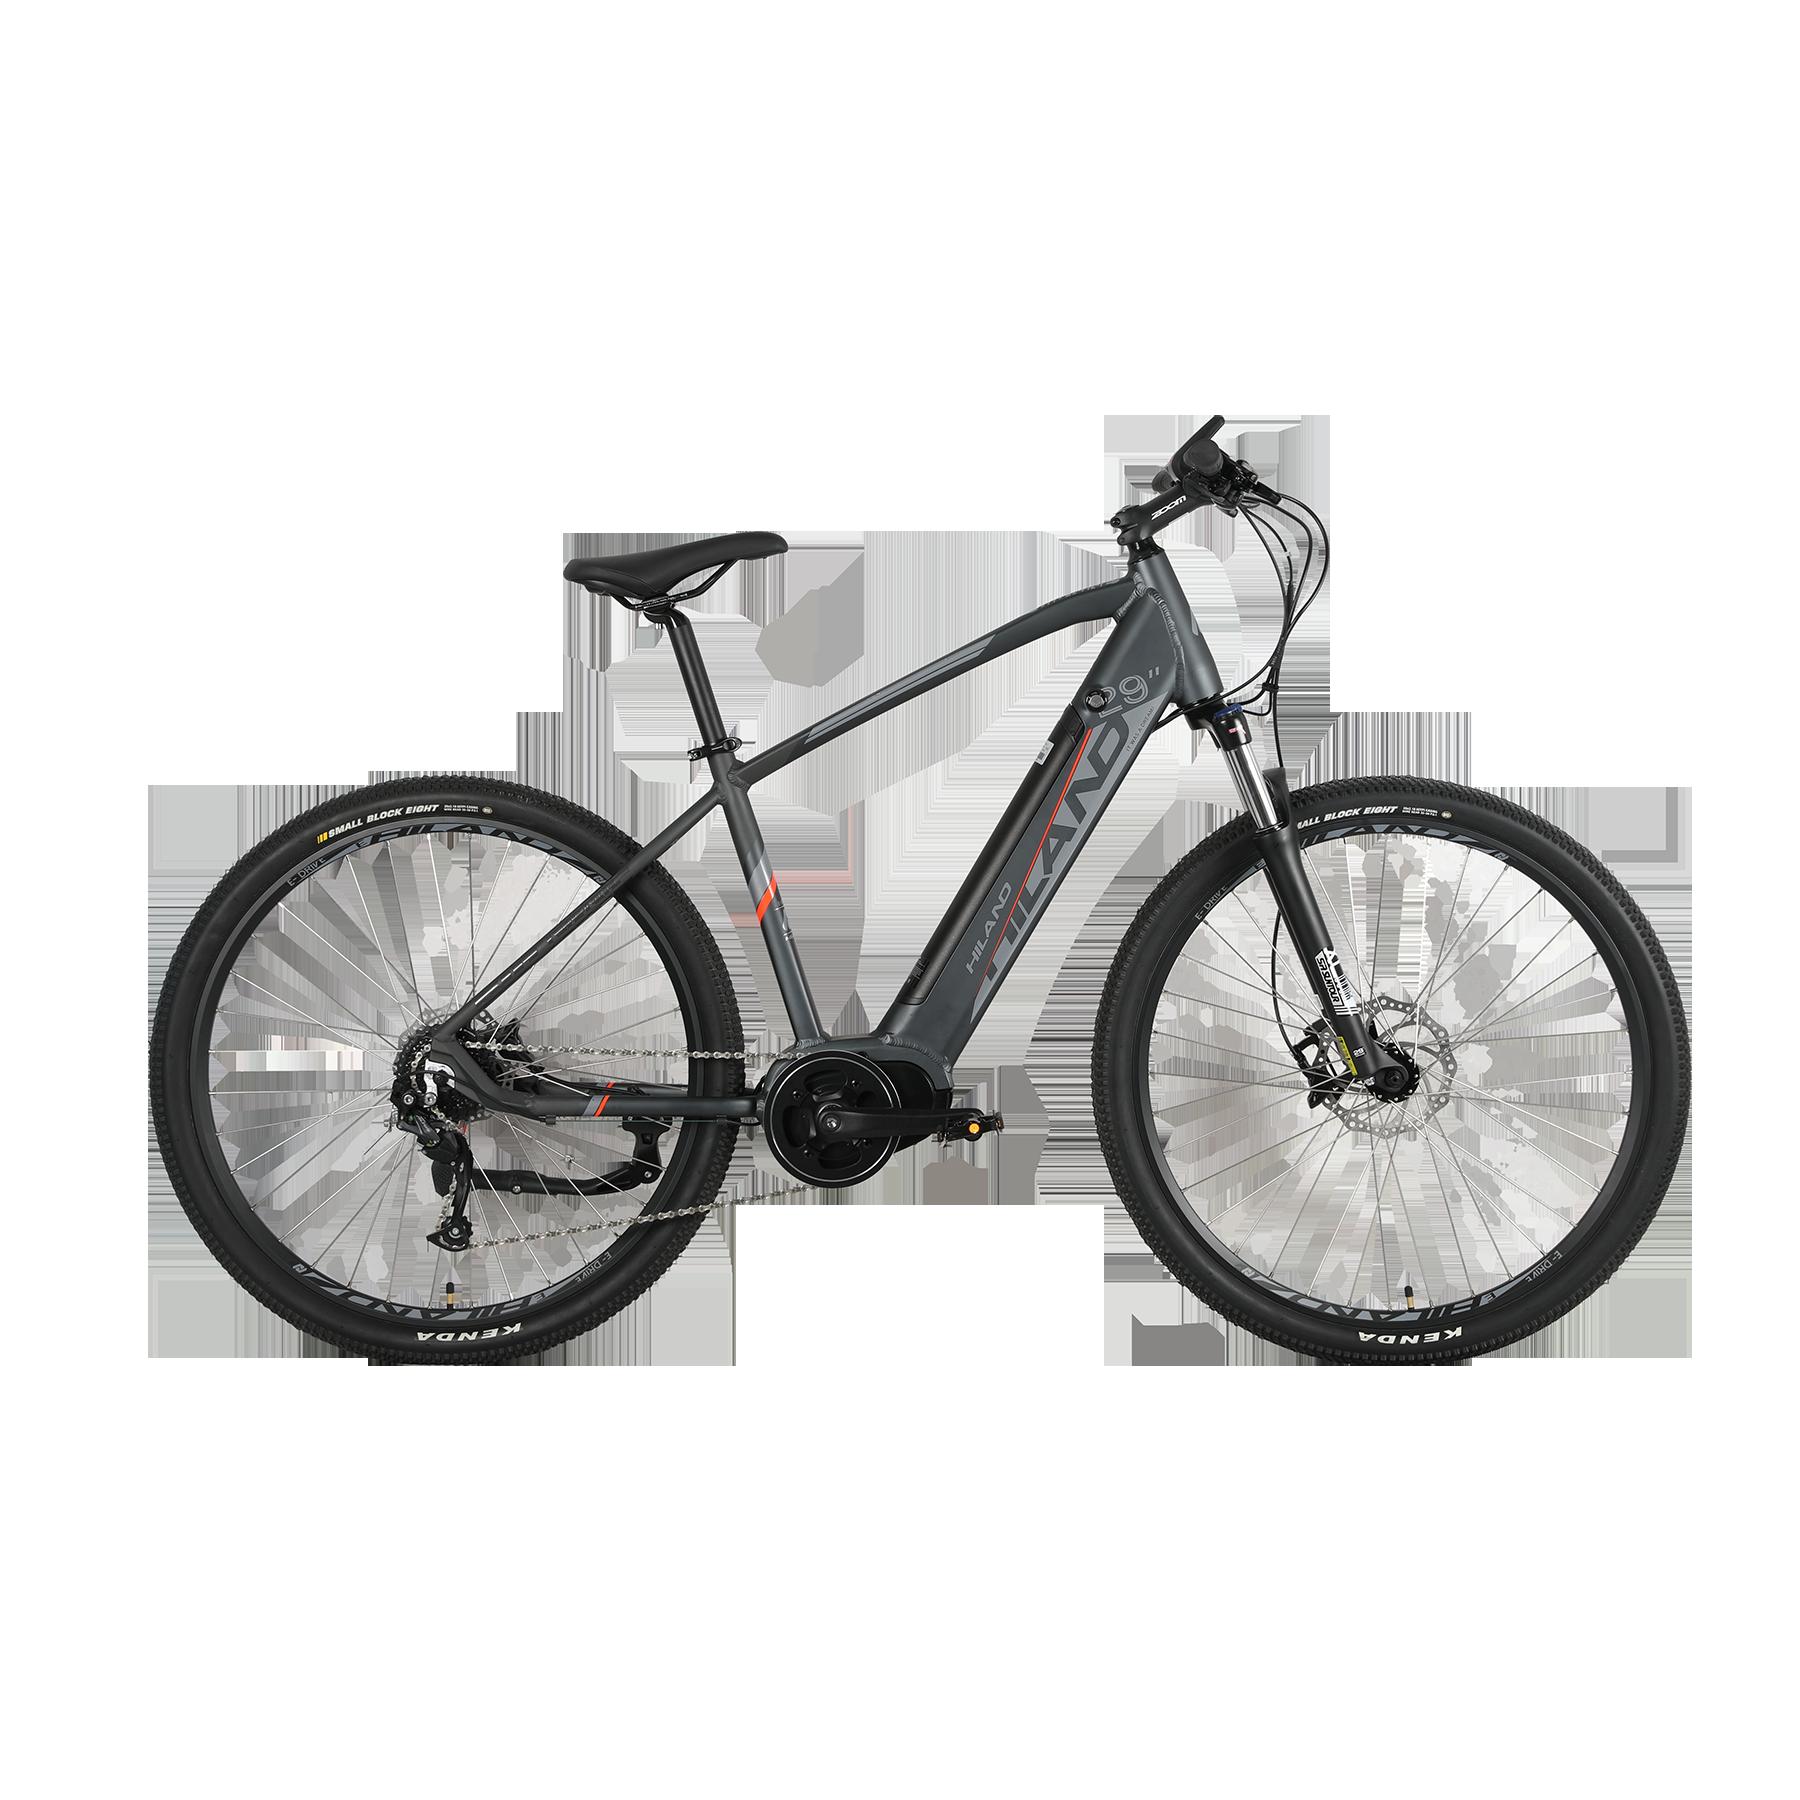 "2020 New Design High Quality Alloy Frame 29"" MTB E-BIKE Electric Bicycle"